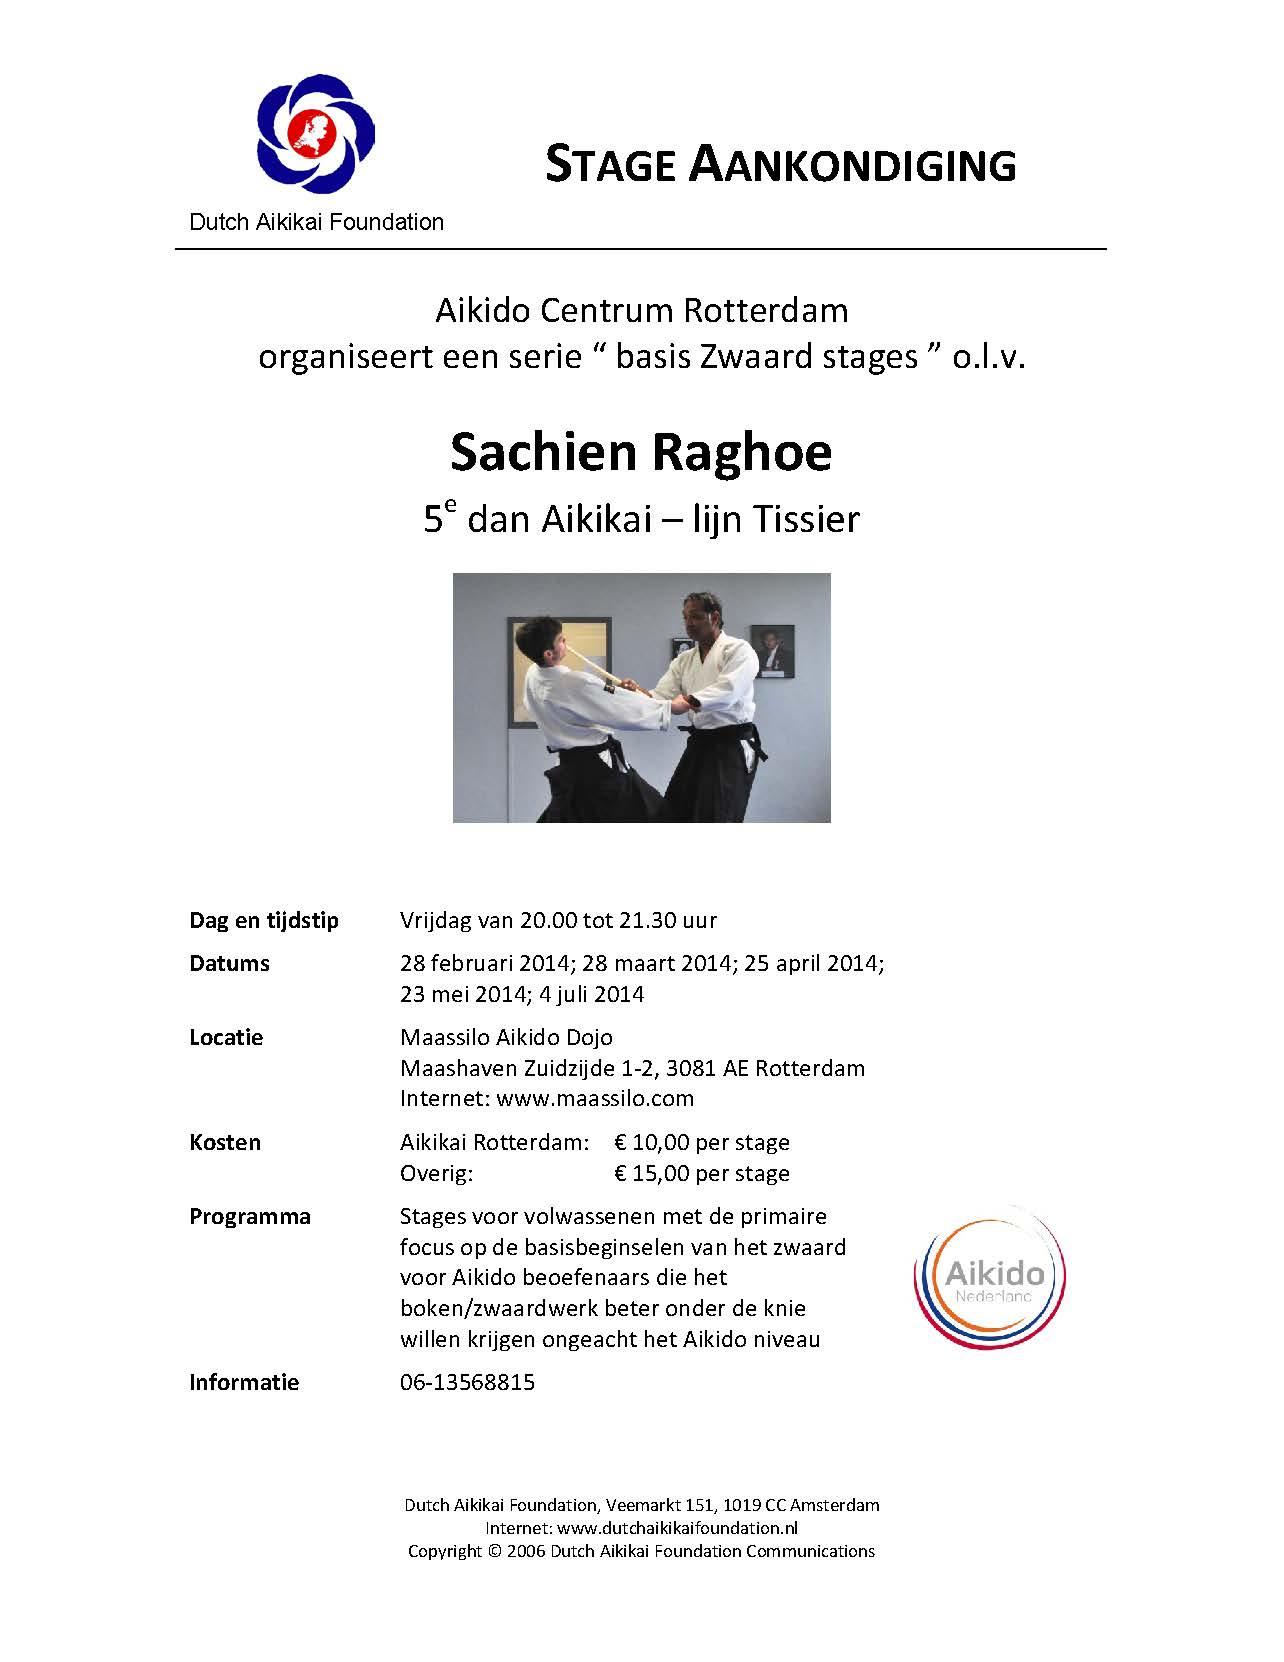 Stage Aankondiging ACR Zwaardstage Q12 2014 o.l.v. Sachien Raghoe